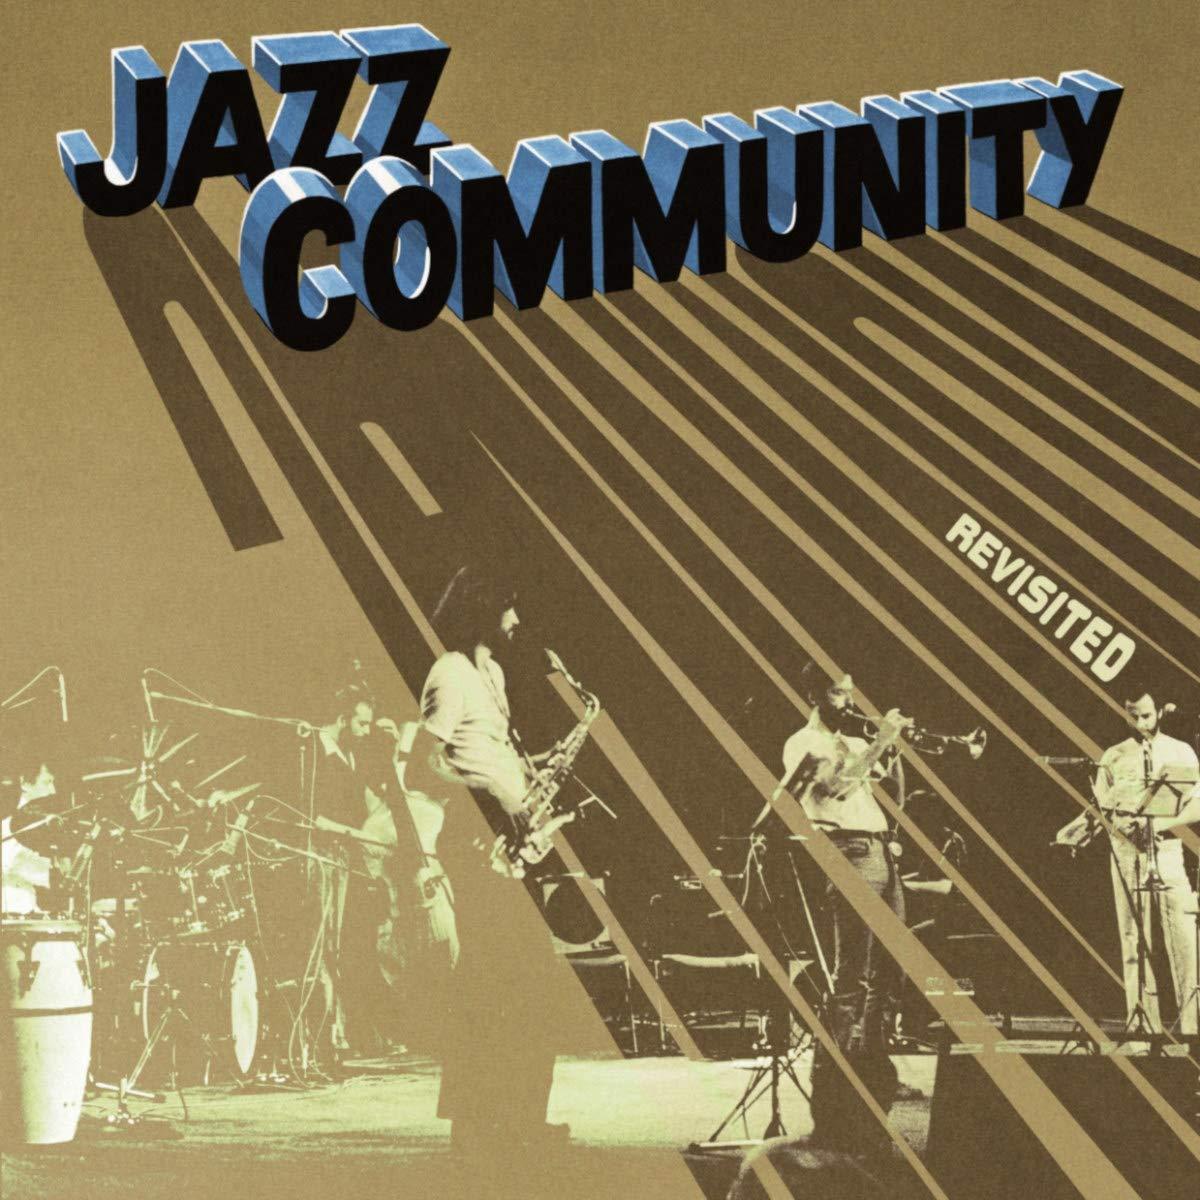 Jazz Community - Revisited